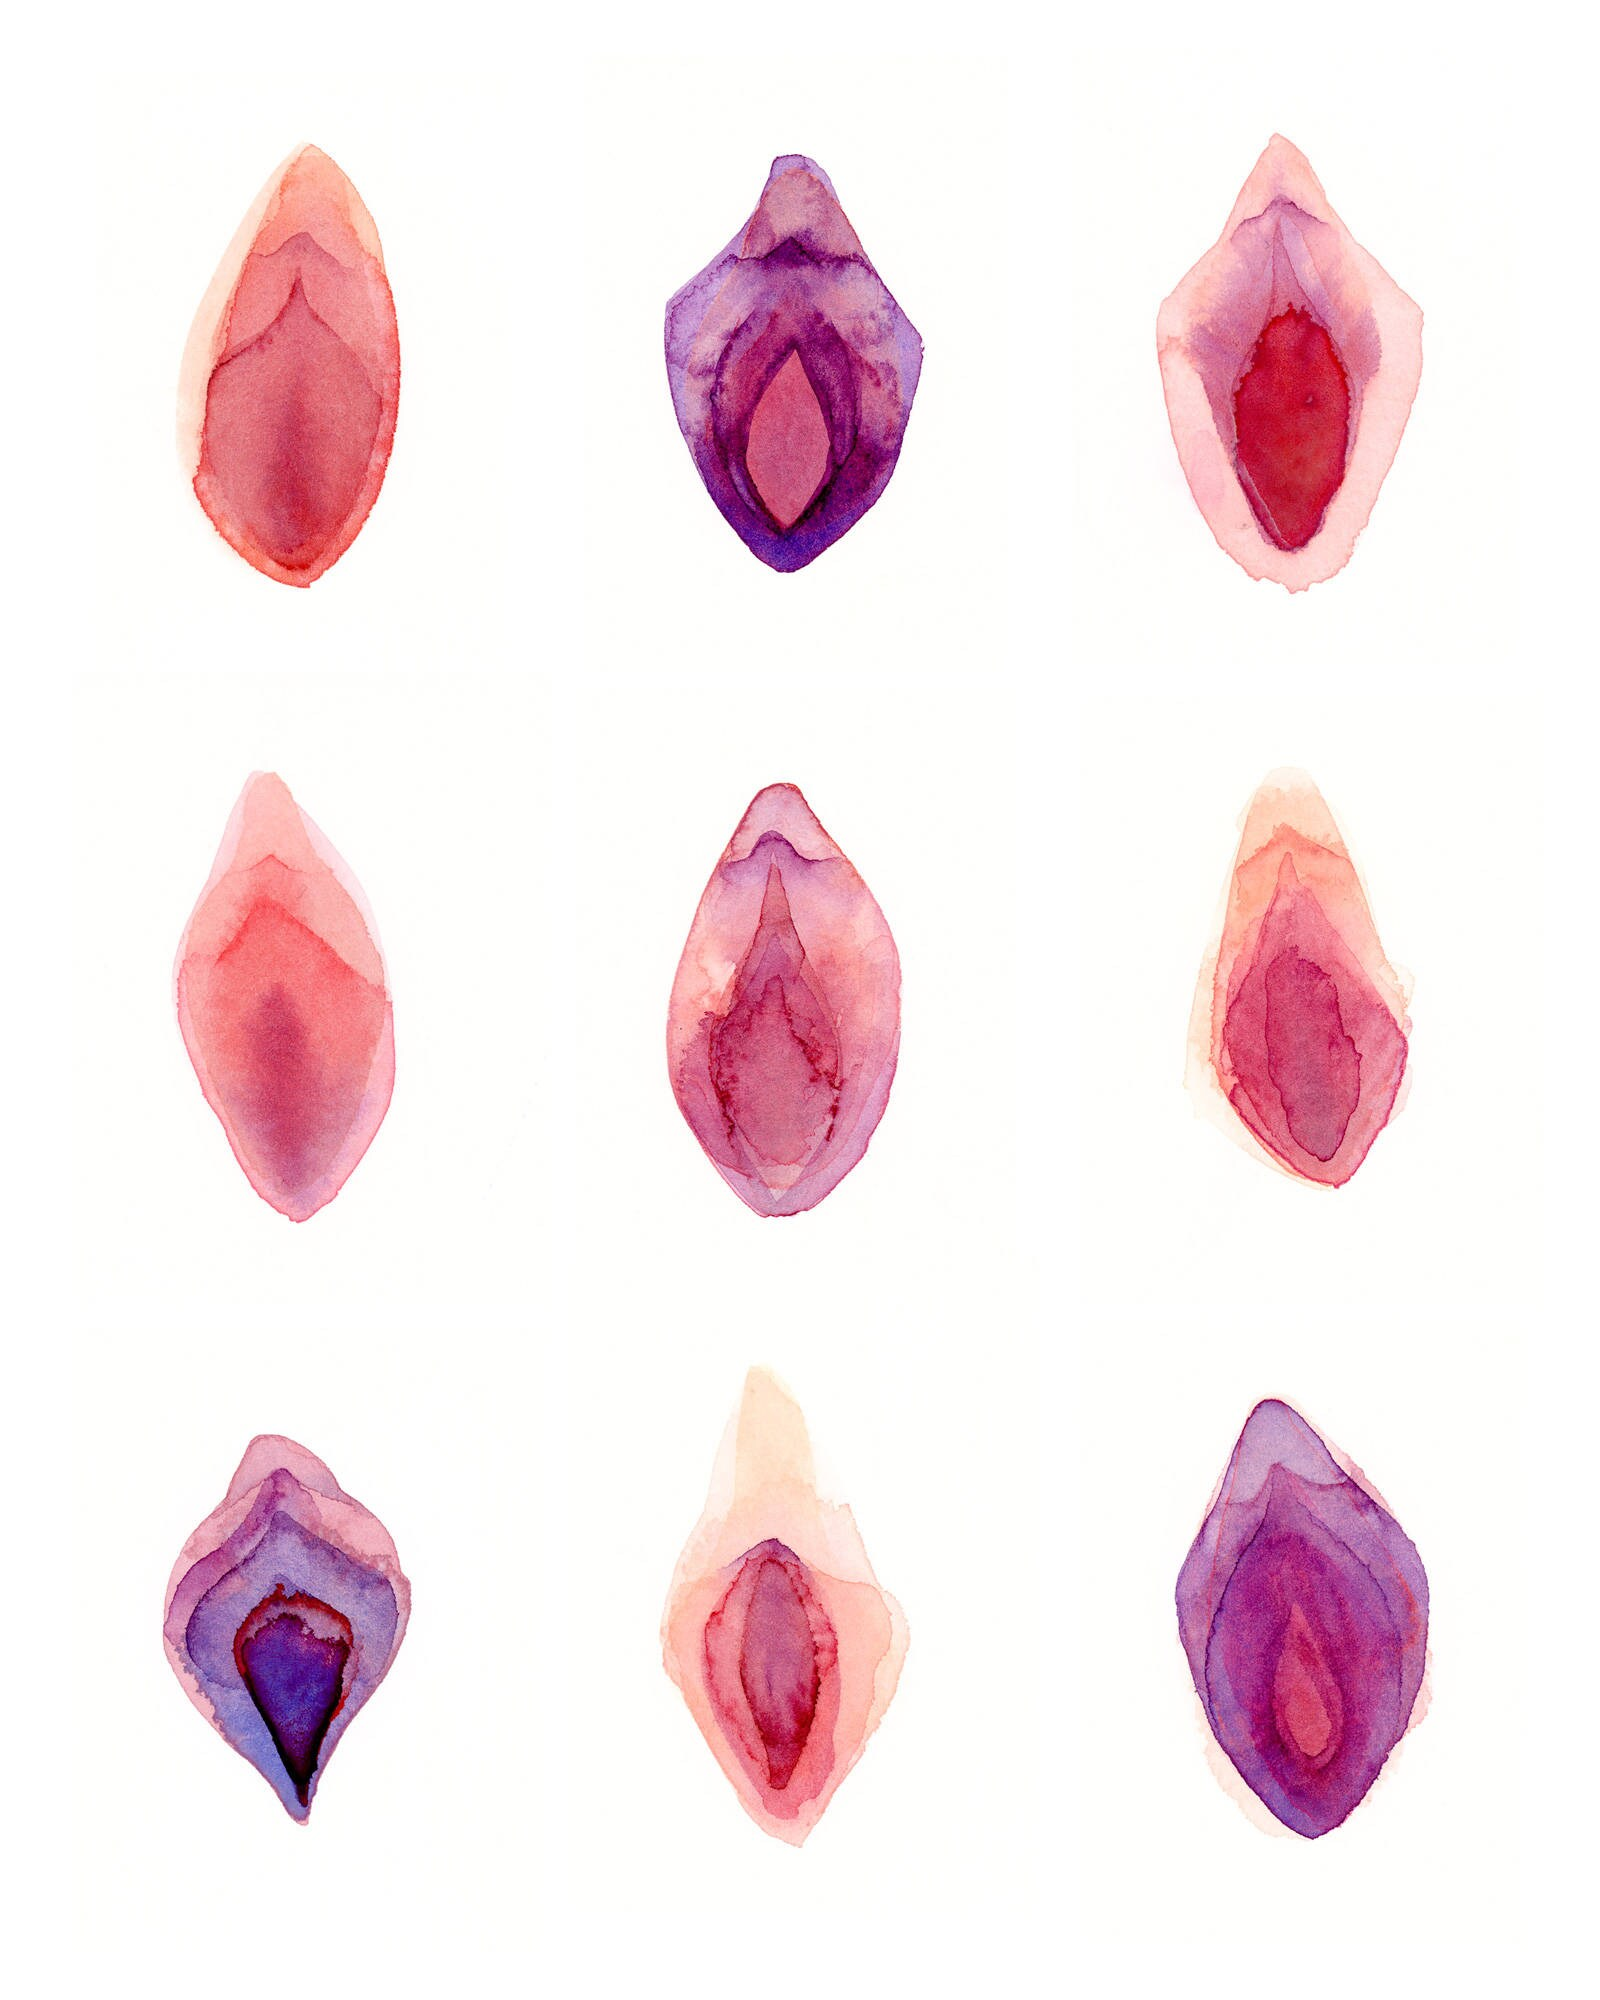 Aquarell Vulva 8 x 10 verfilzt Aquarell Kunstdruck   Etsy